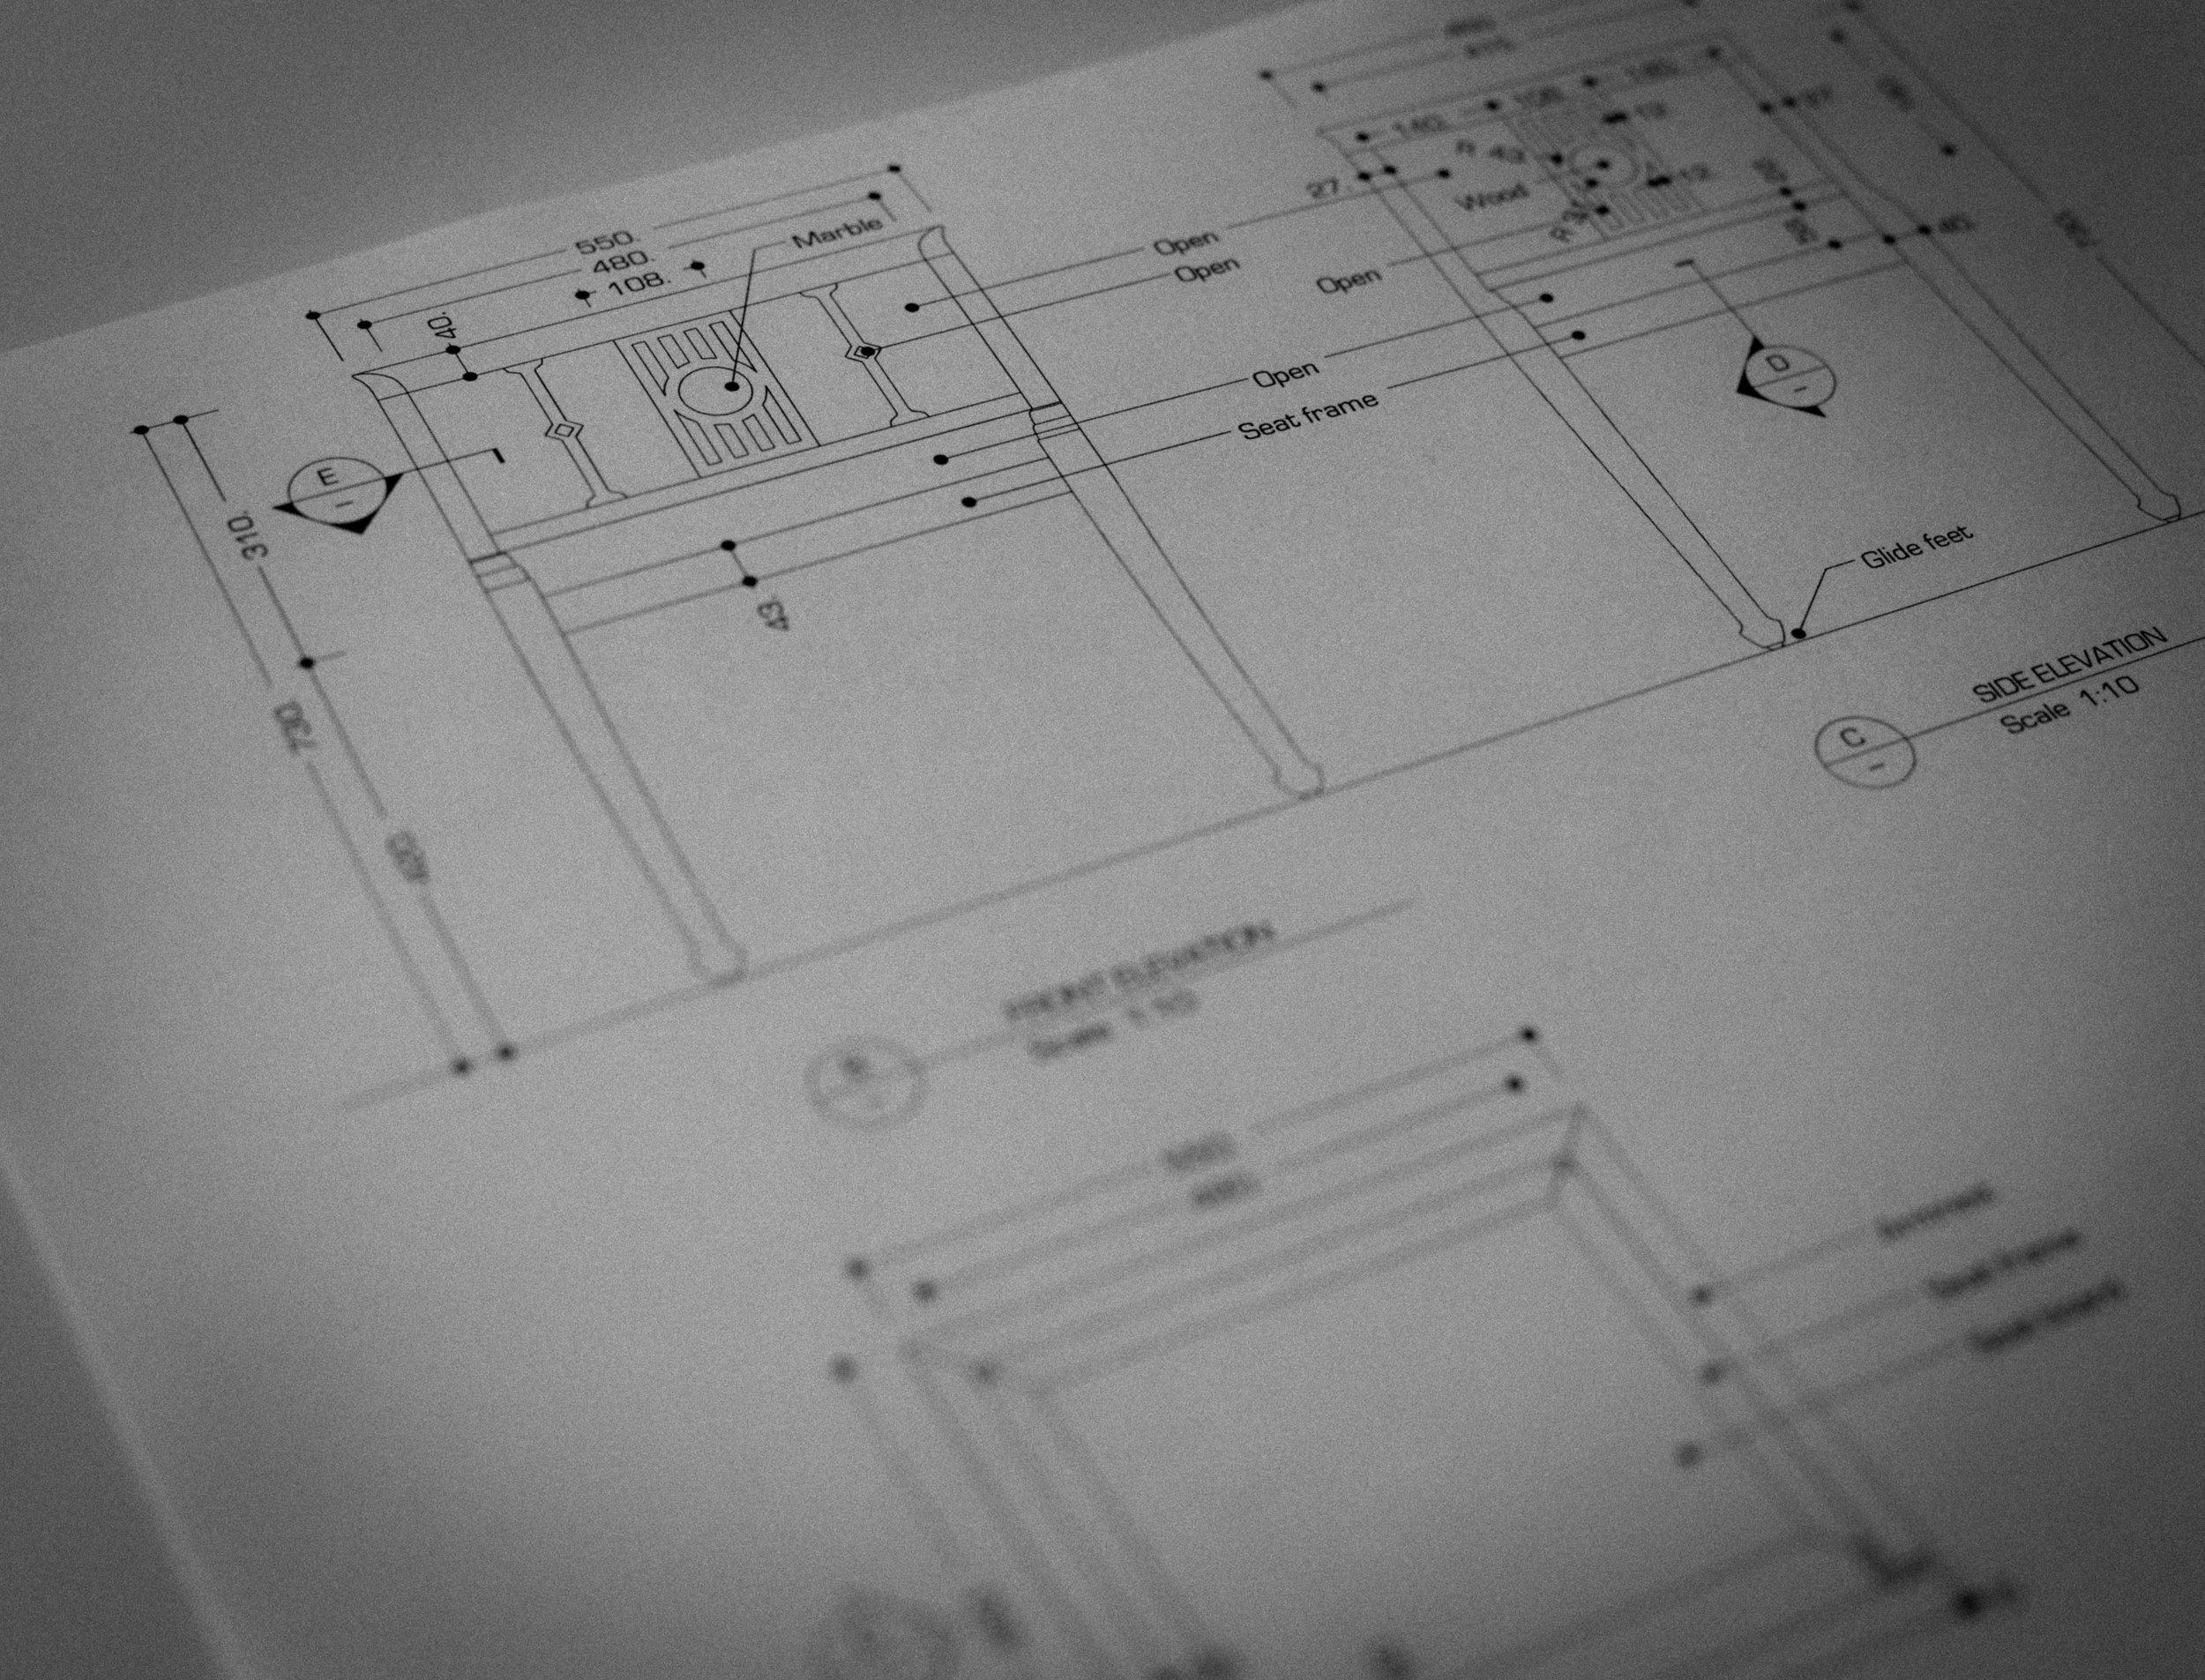 ....bespoke furniture : design drawings..特别定制家具 : 设计图....